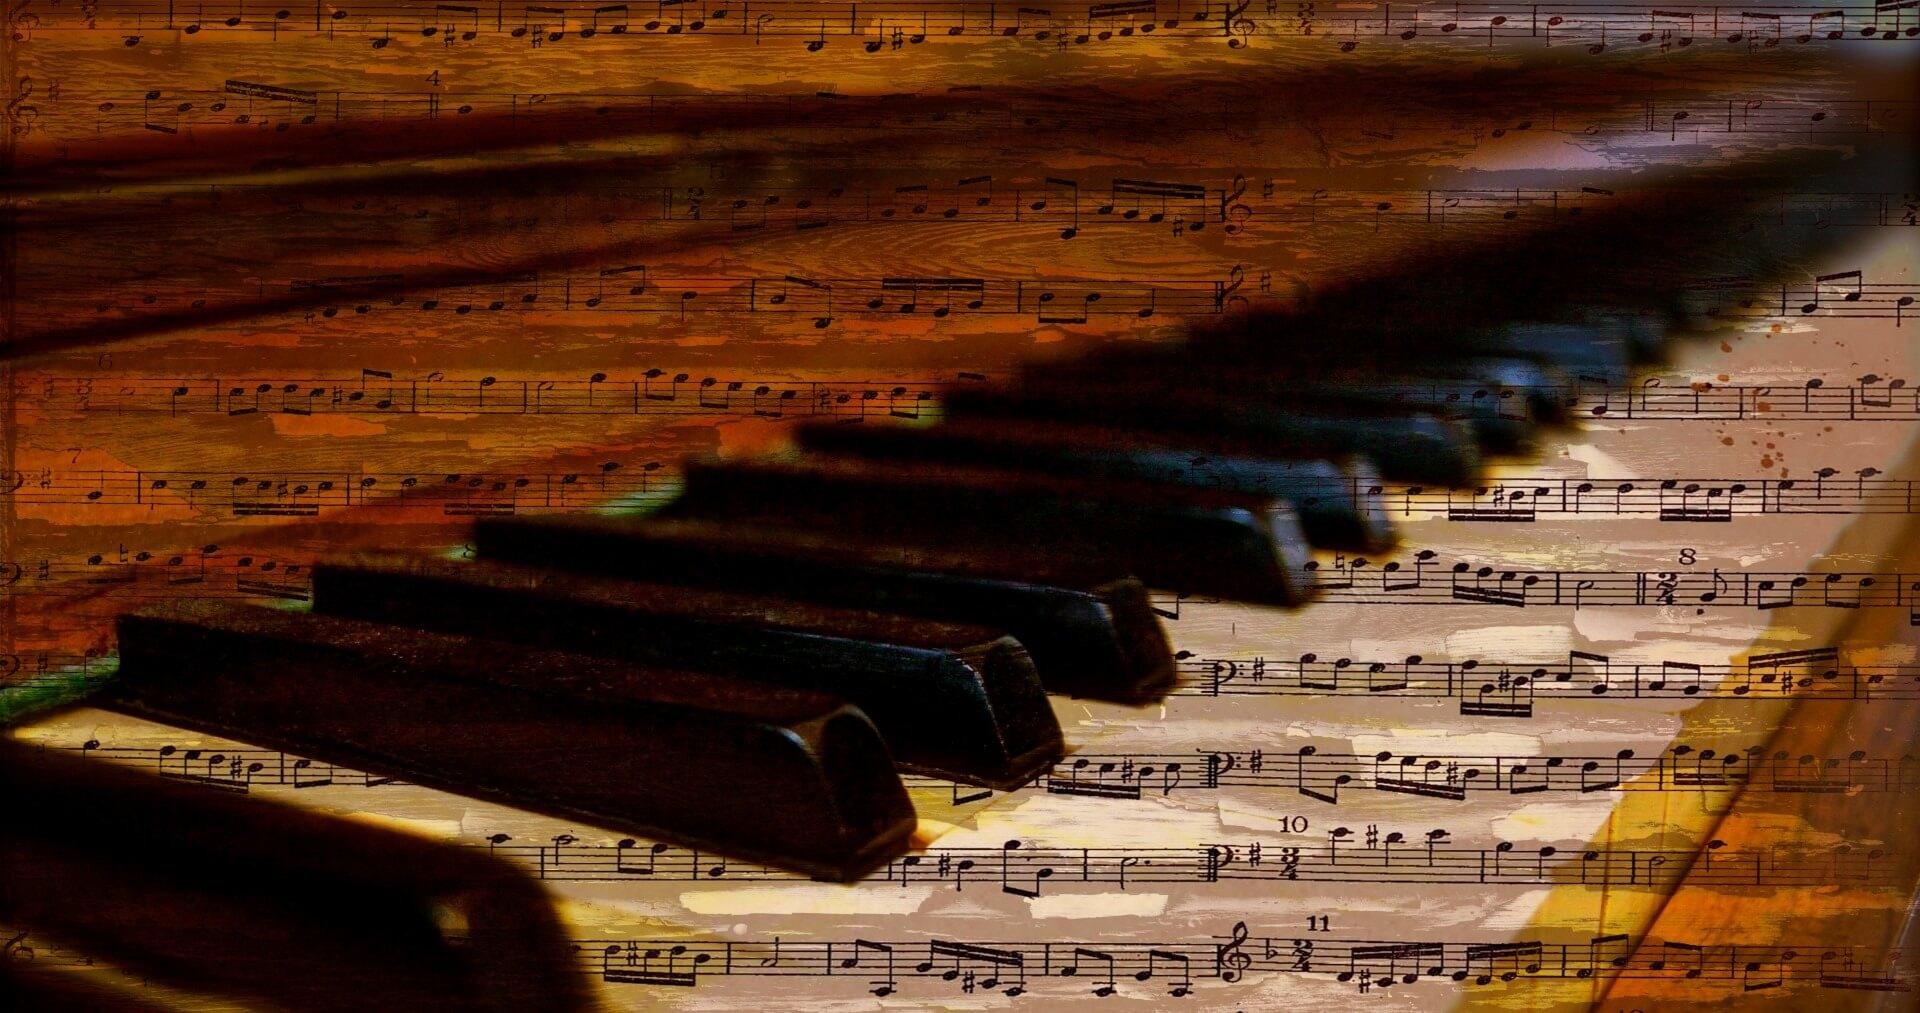 Klavier, Noten, Klassik (c) kaz / pixabay.de